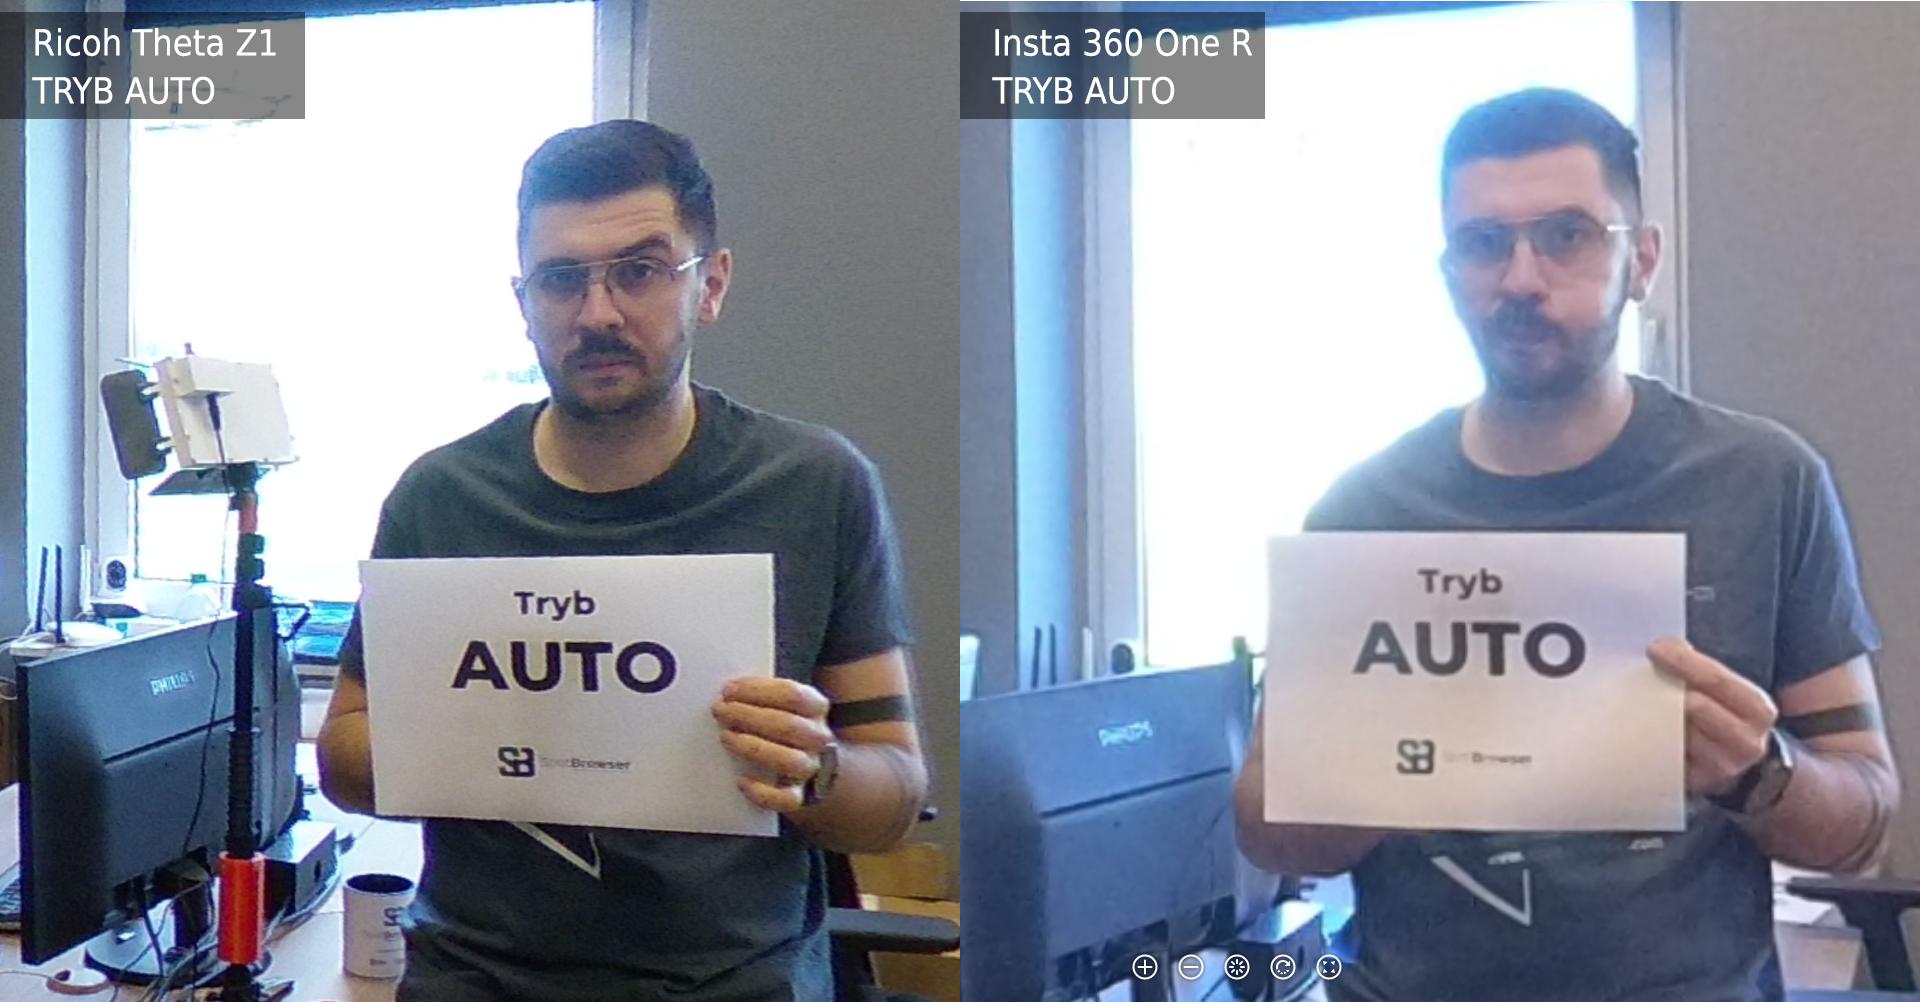 Ricoh Theta Z1 vs Insta 360 One R Tryb Auto